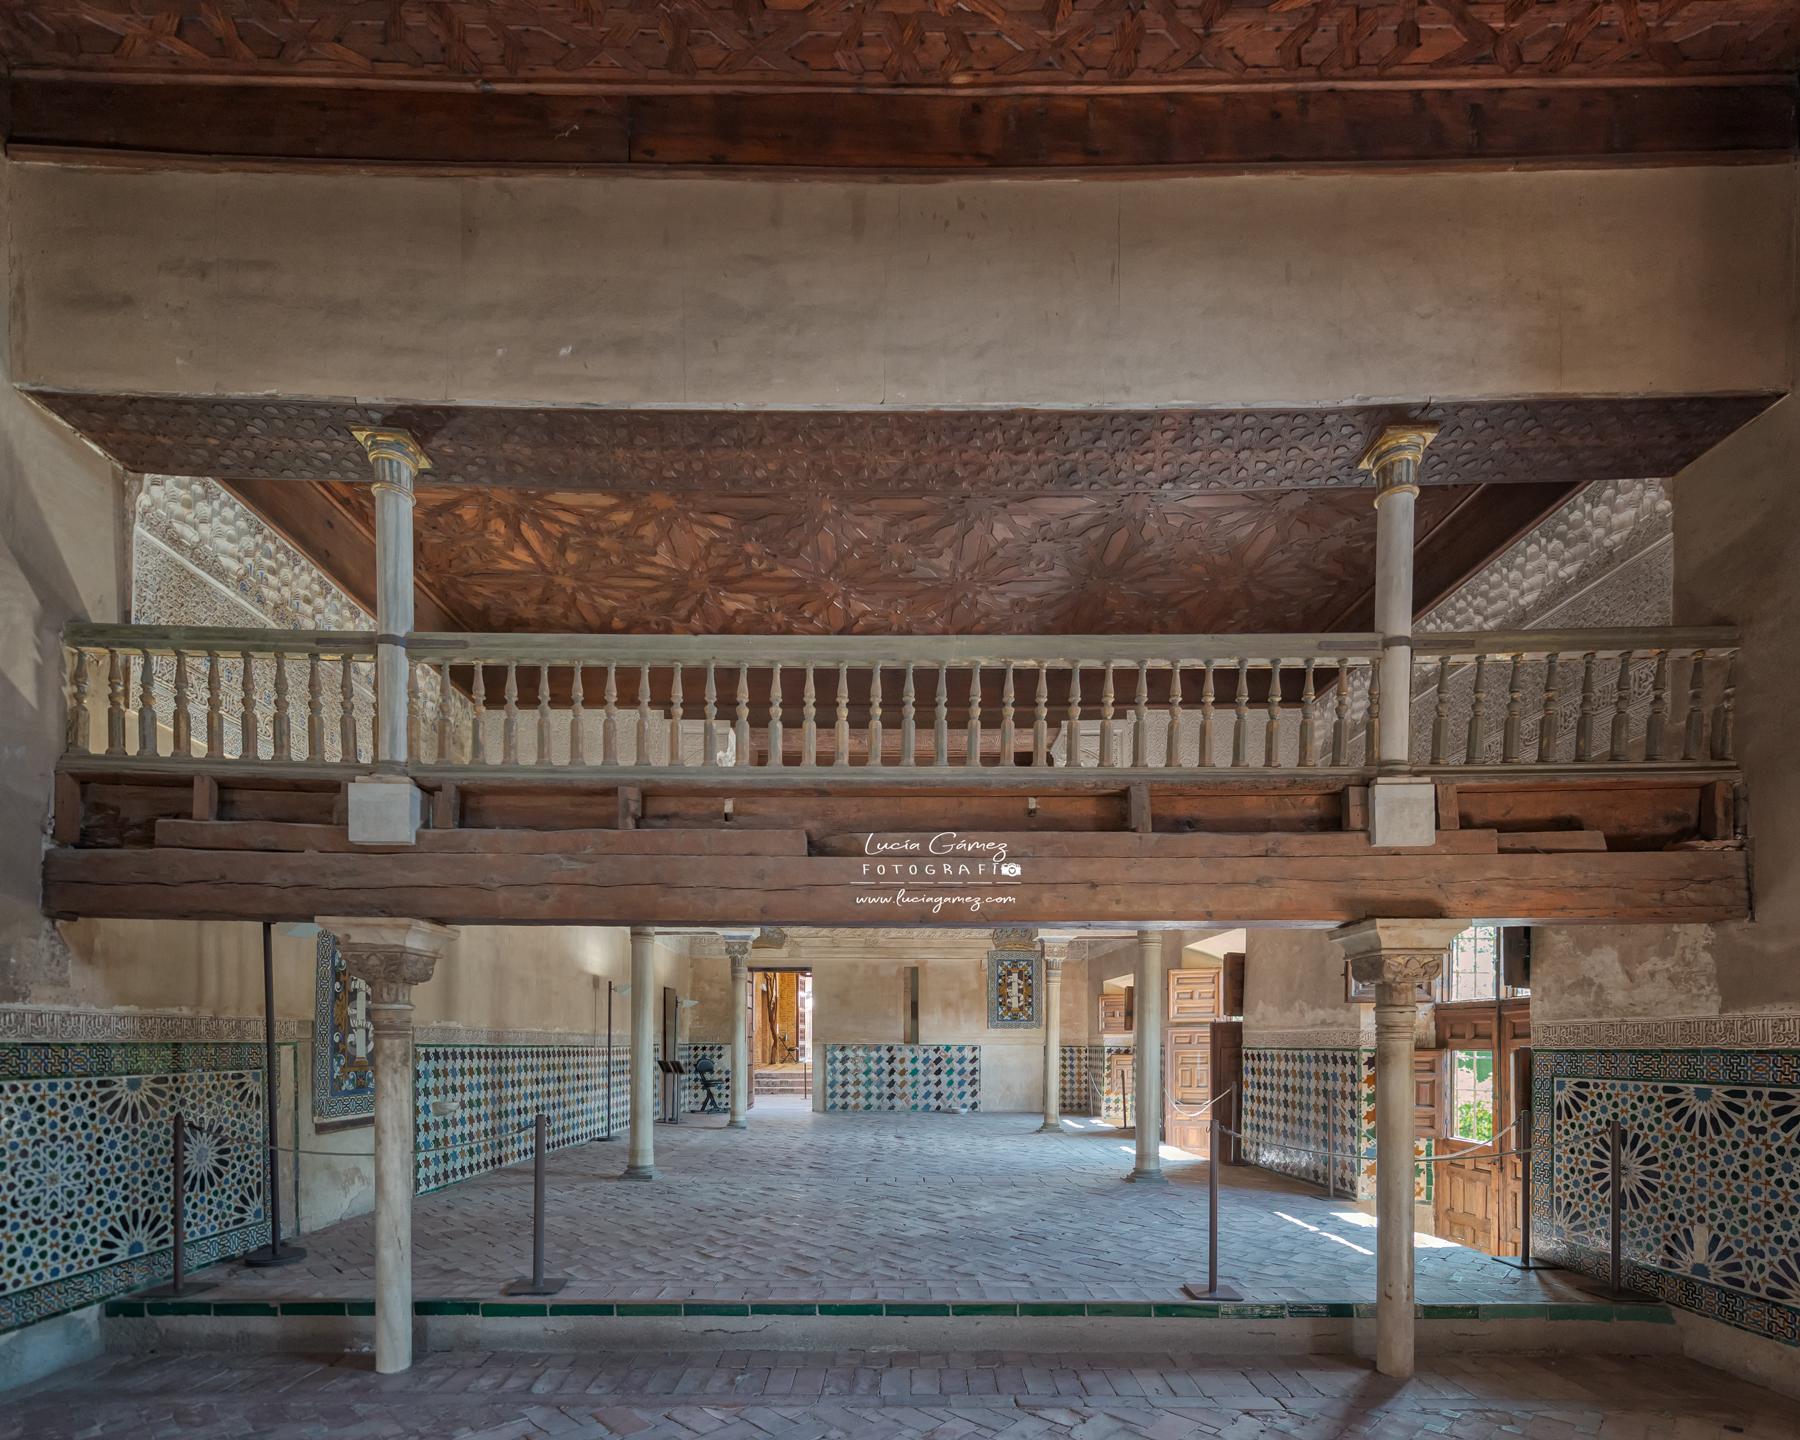 Sala del Mexuar (II). Alhambra